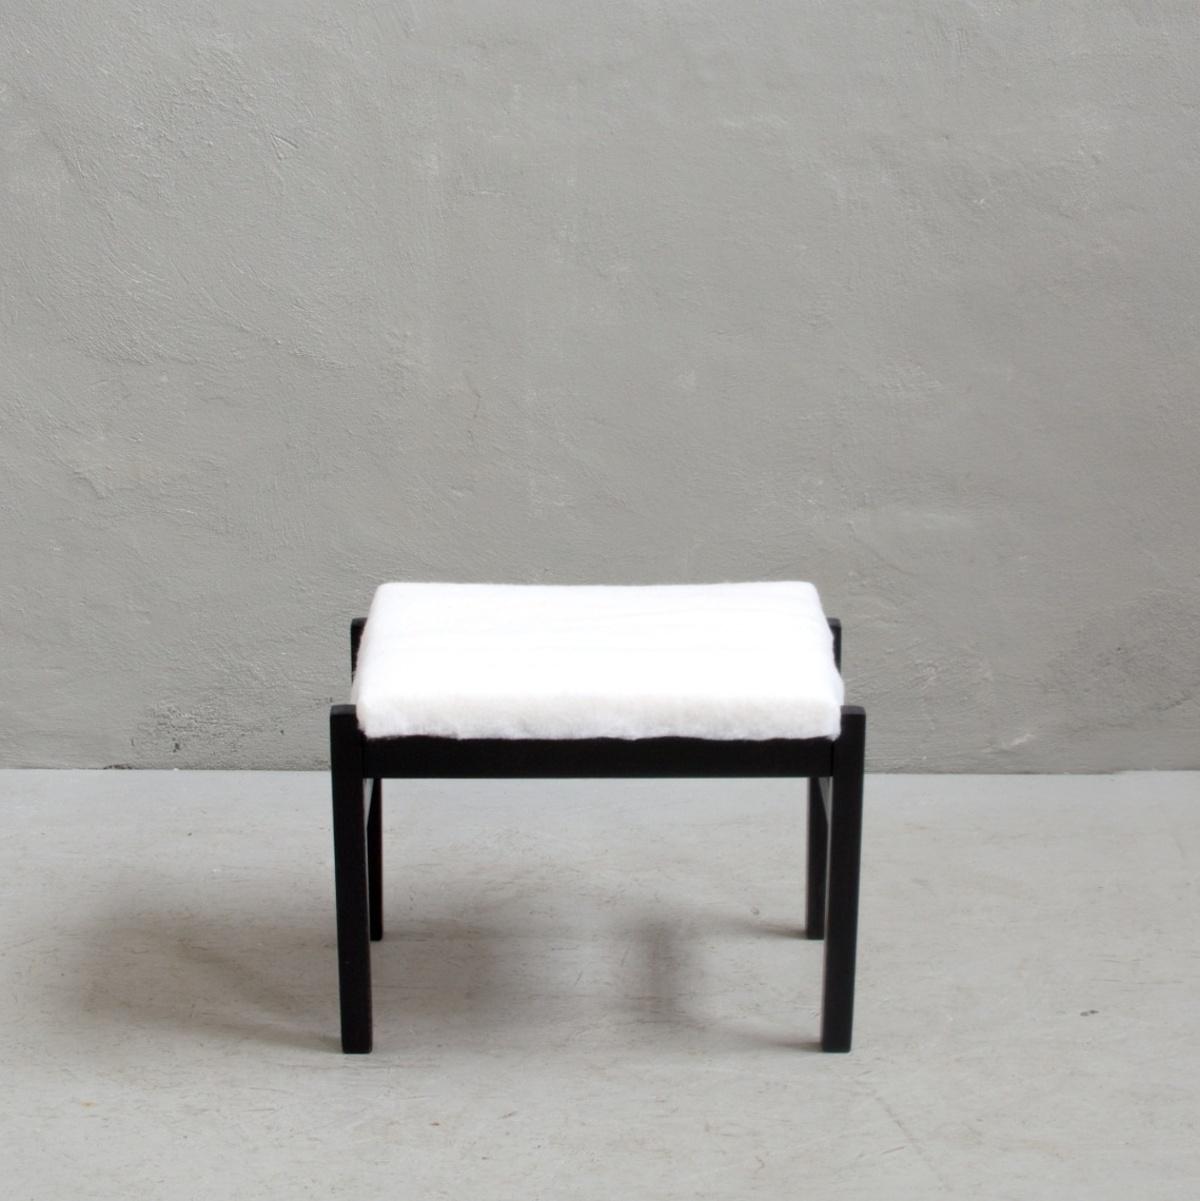 Prodej a renovace retro nábytku retro křeslo a židle